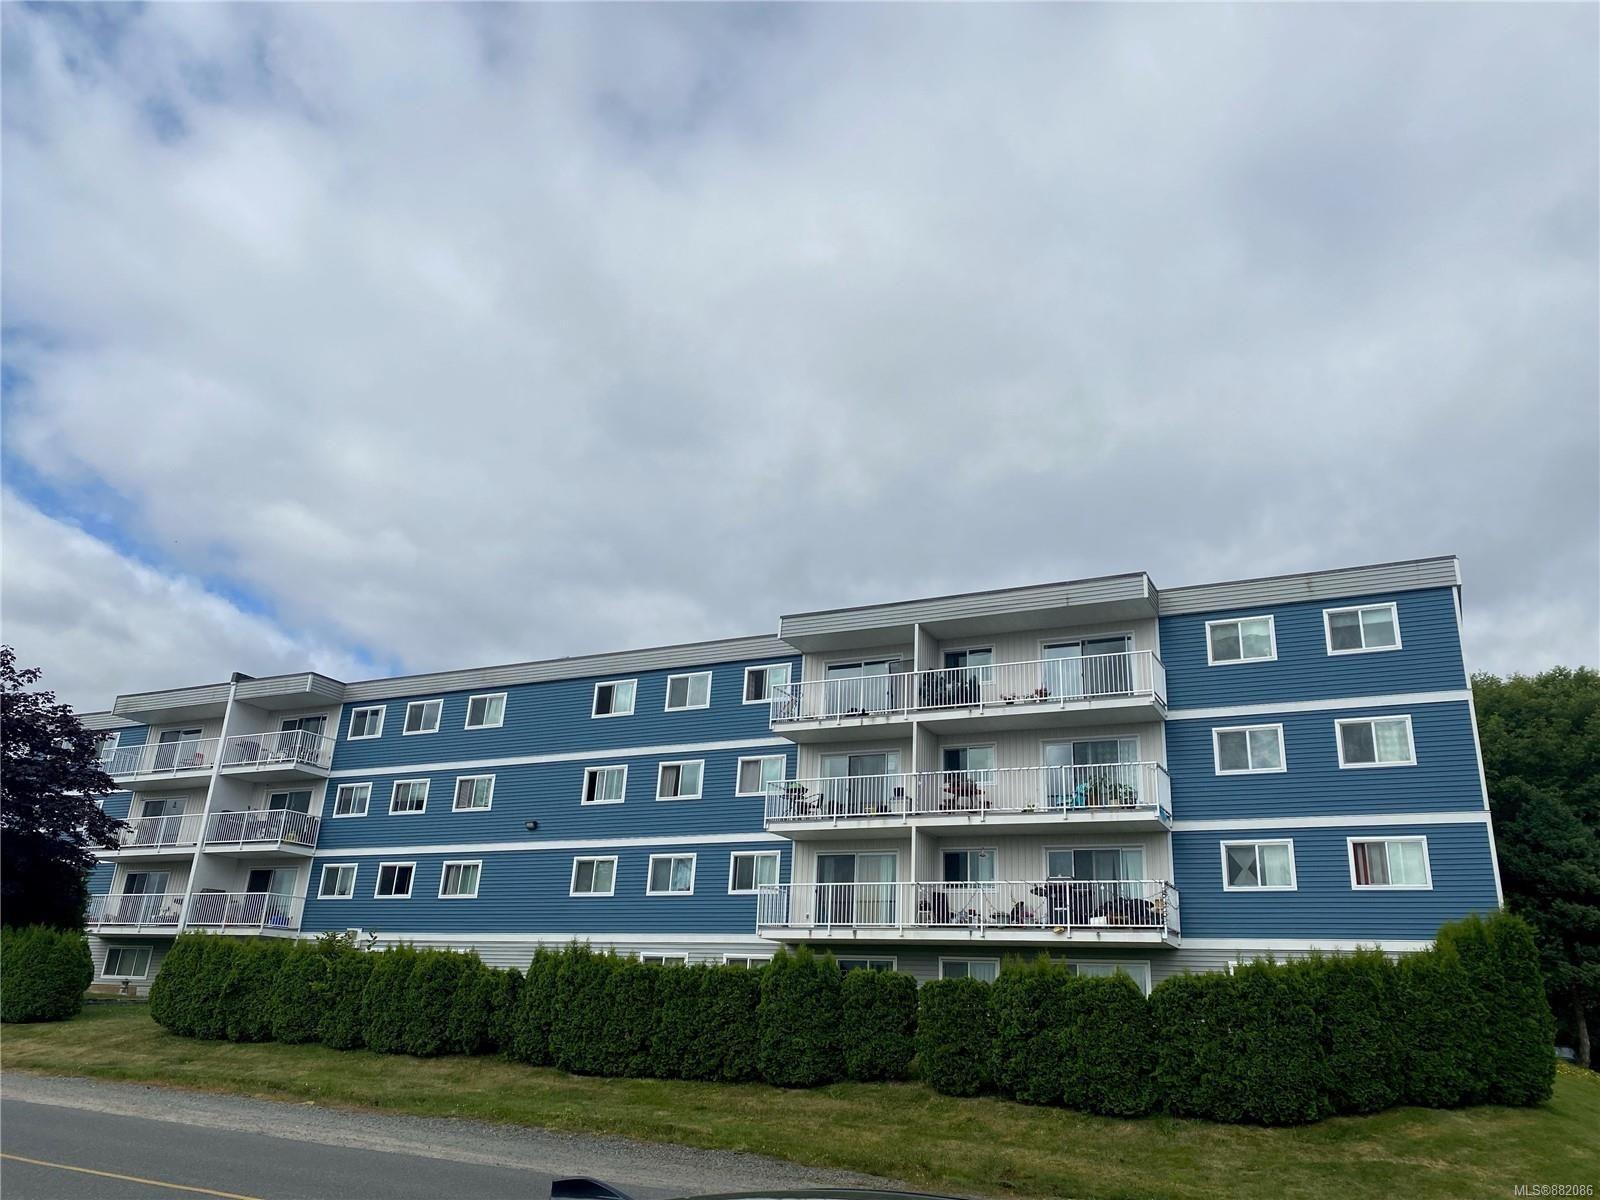 Main Photo: 305 7450 Rupert St in : NI Port Hardy Condo for sale (North Island)  : MLS®# 882086